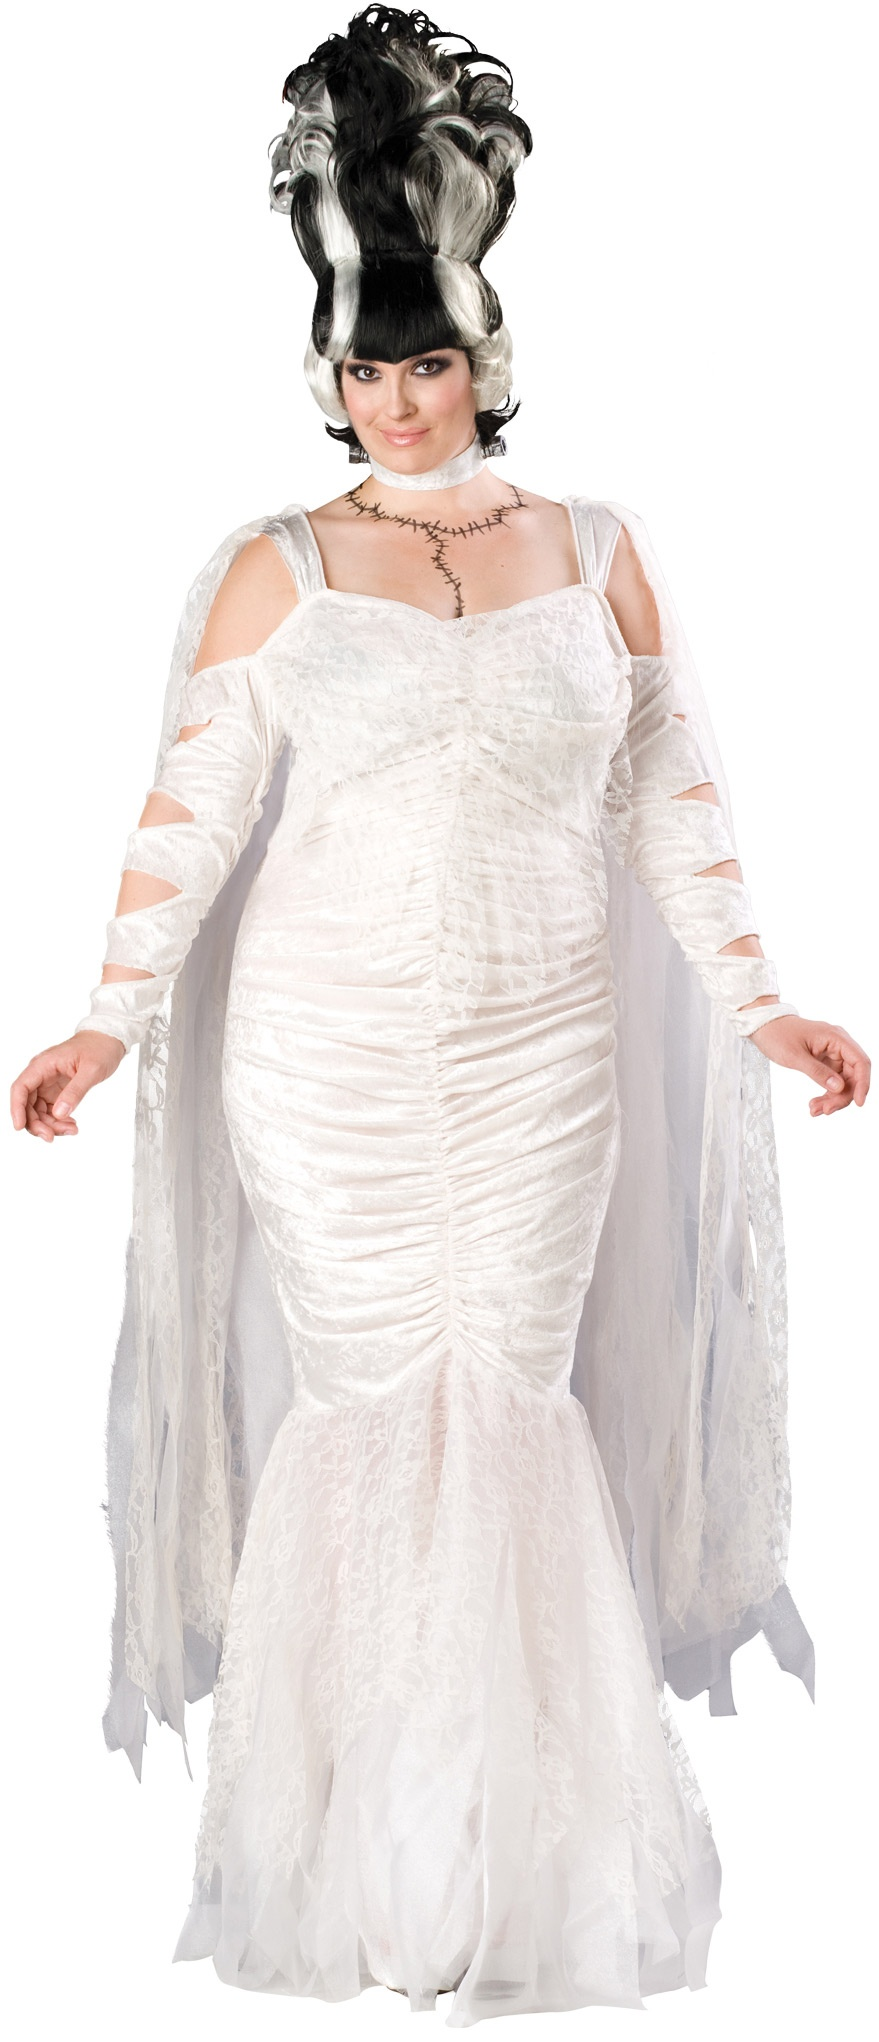 Plus size corpse bride costumes eligent prom dresses for Corpse bride wedding dress for sale